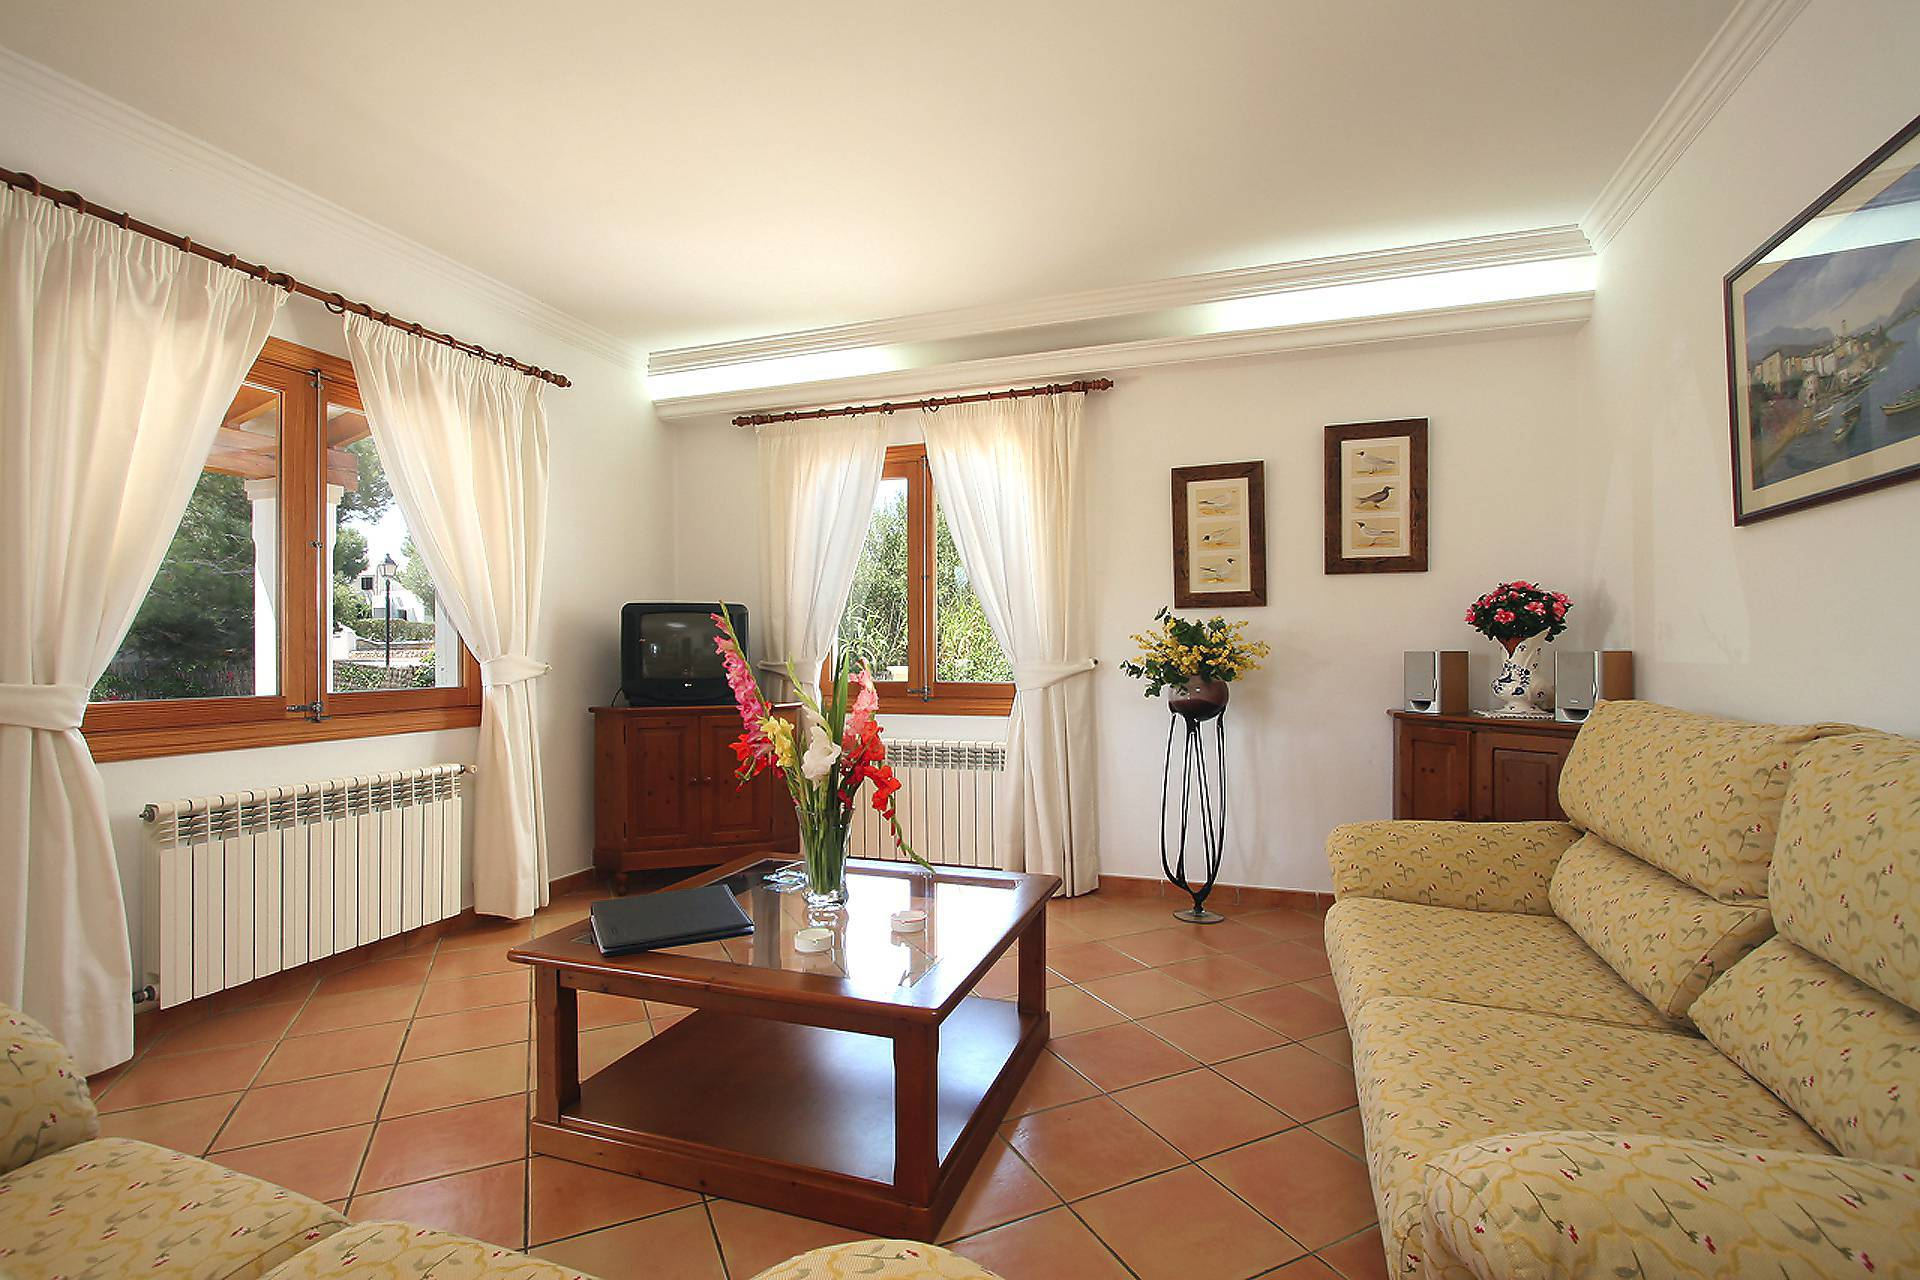 01-128 Rustic holiday home Majorca East Bild 9